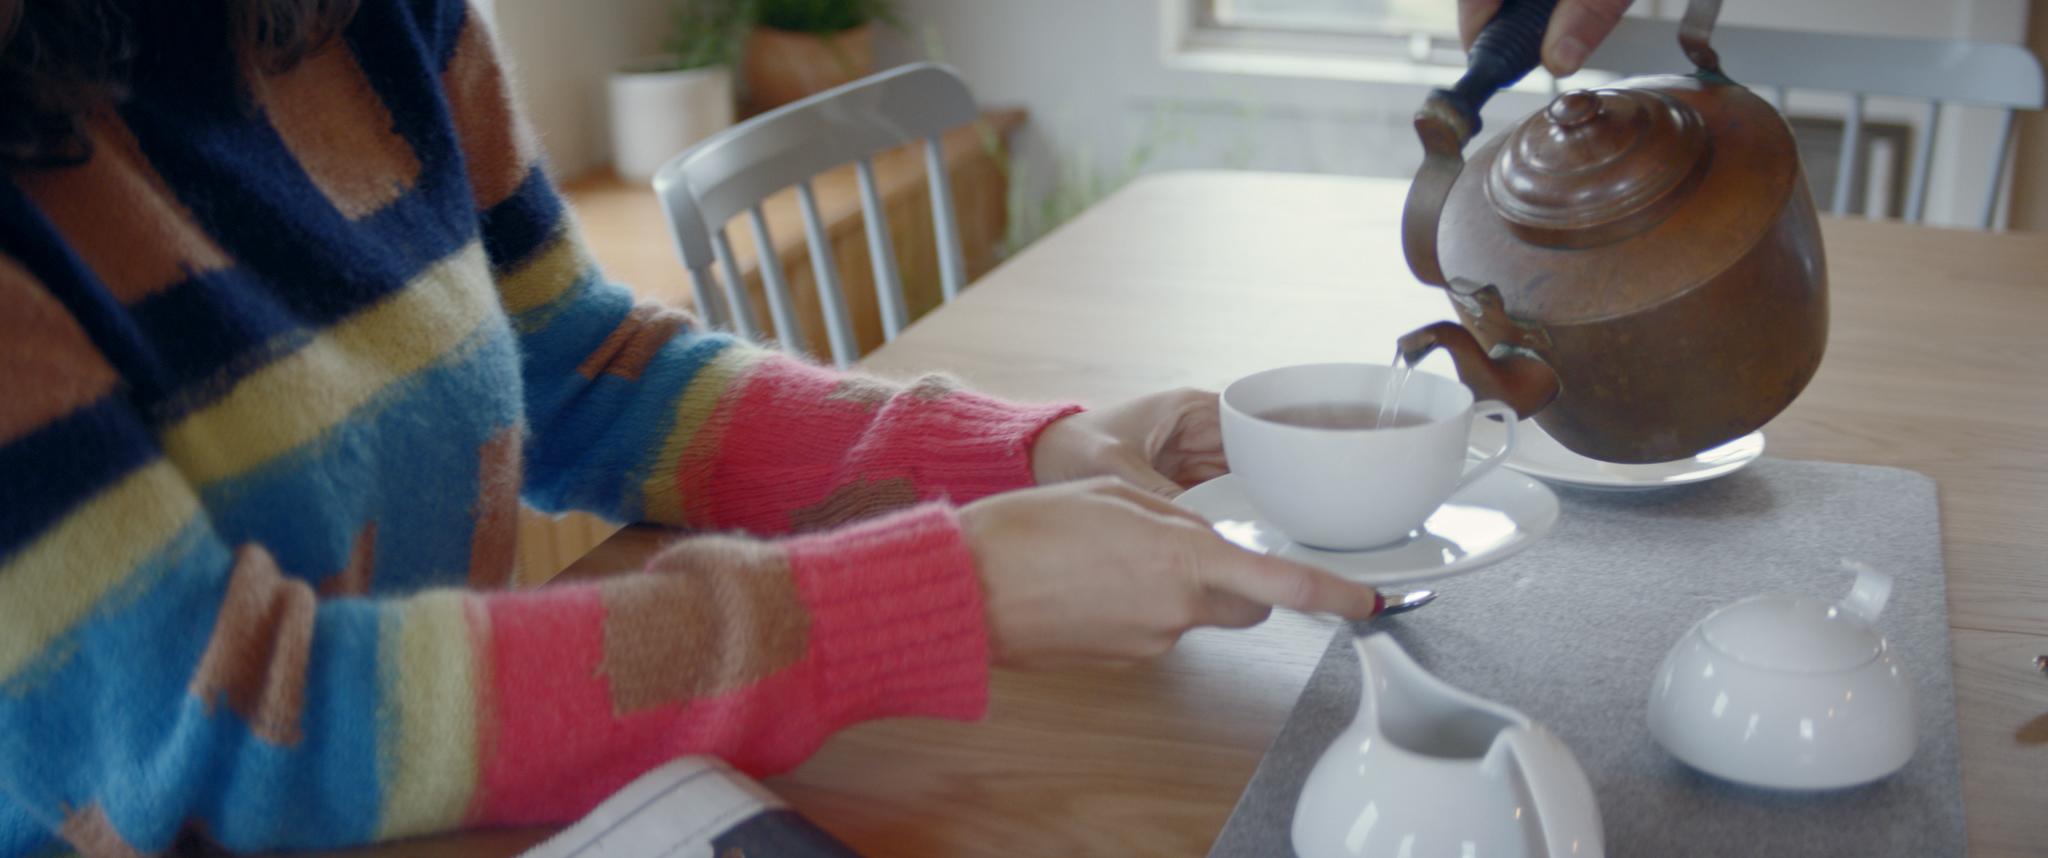 Design Within Reach - Home Comes First - Cinematography by Bill Kirstein.Still013.jpg